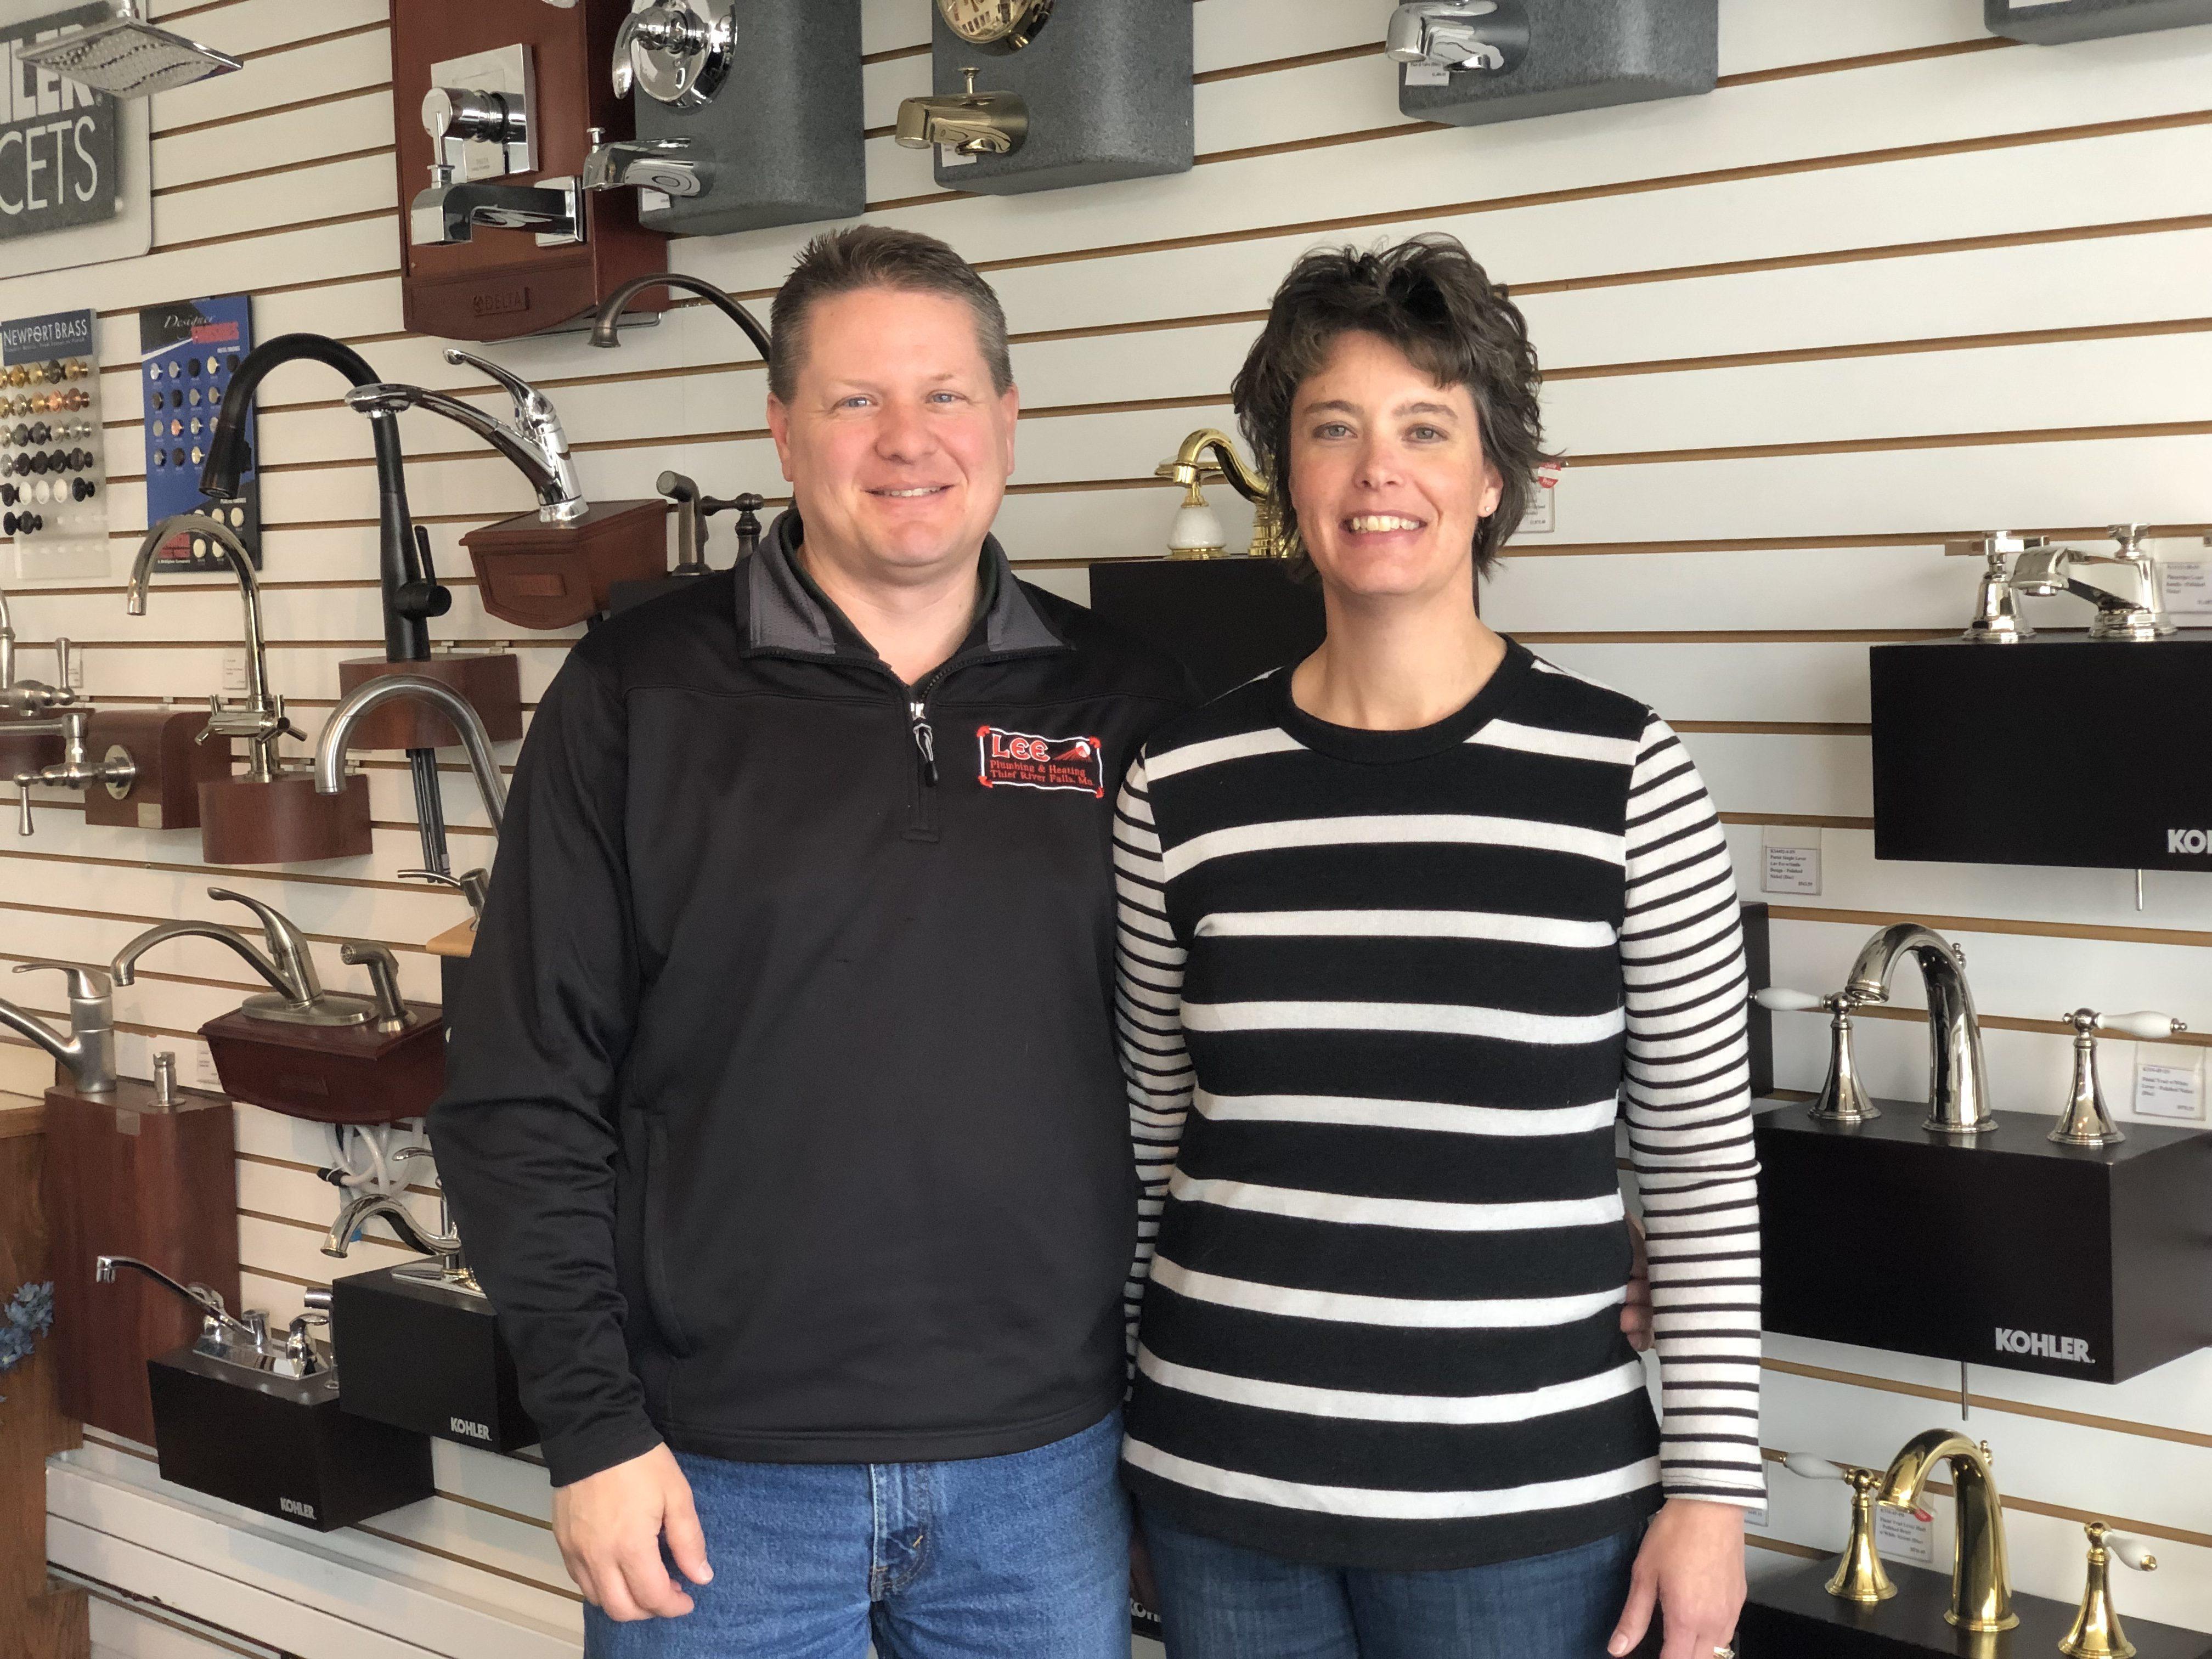 Derek and Stacy Lee, Lee's Plumbing and Heating